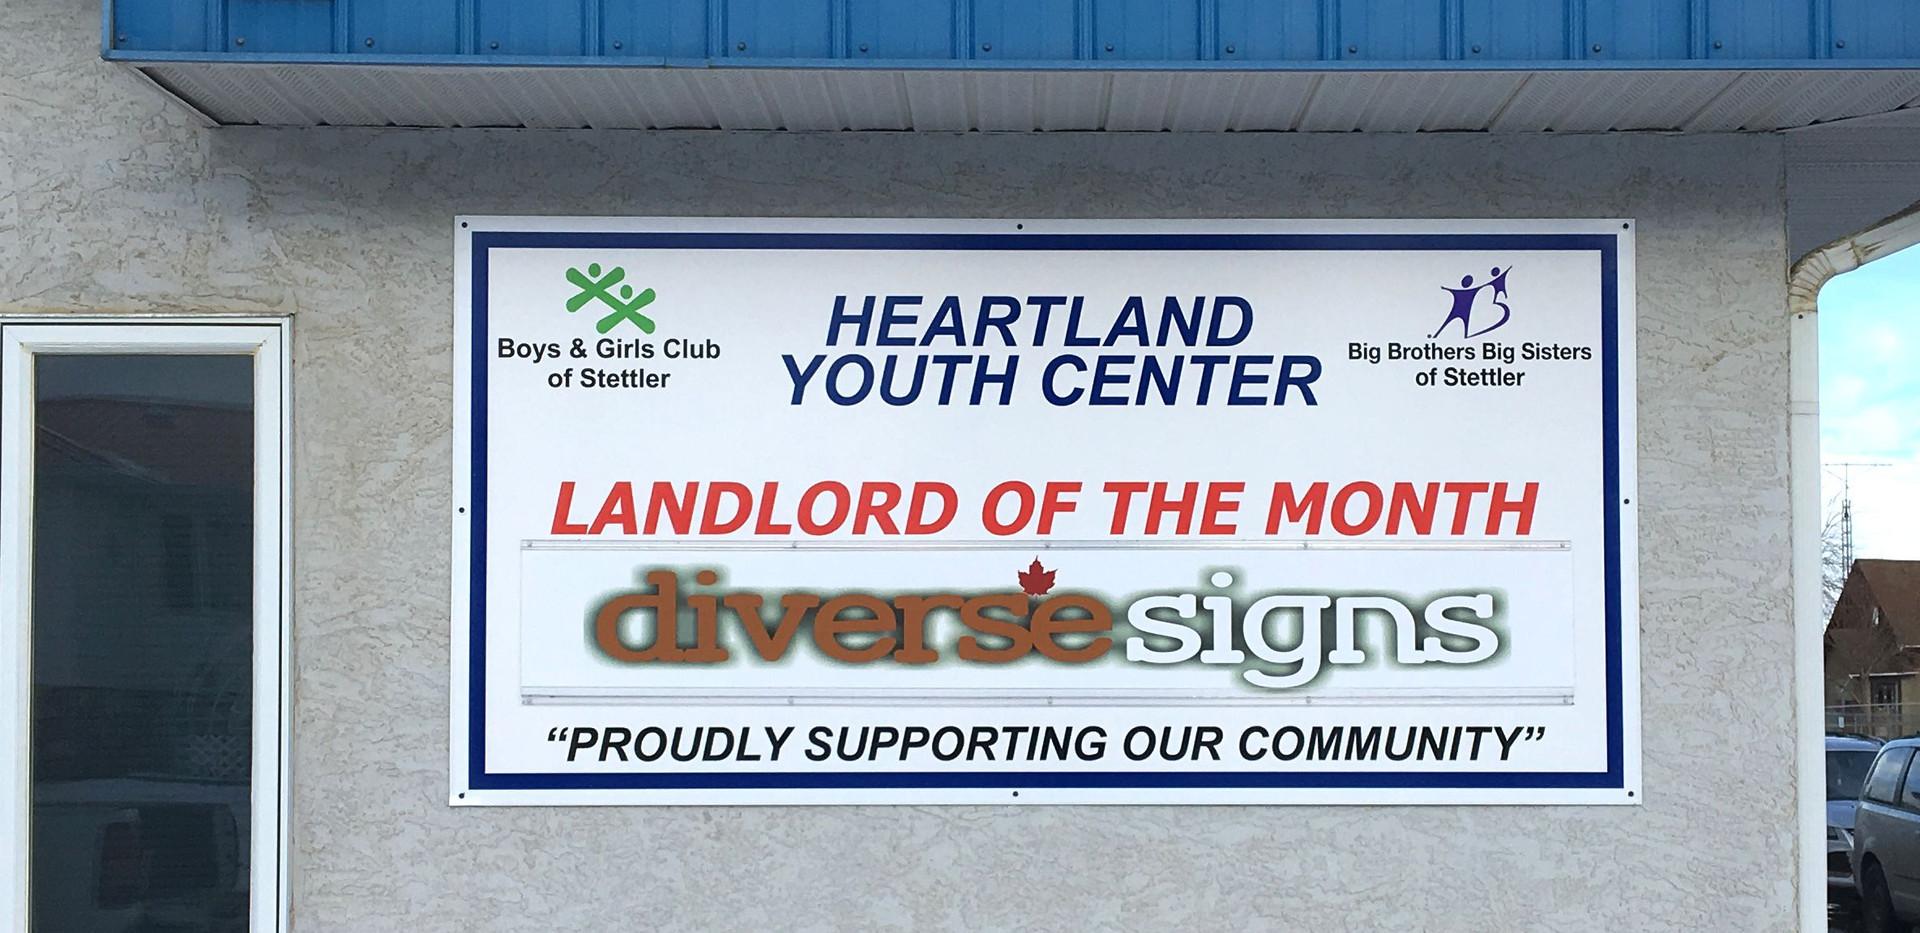 Heartland Youth Center Landlord Sign.JPG